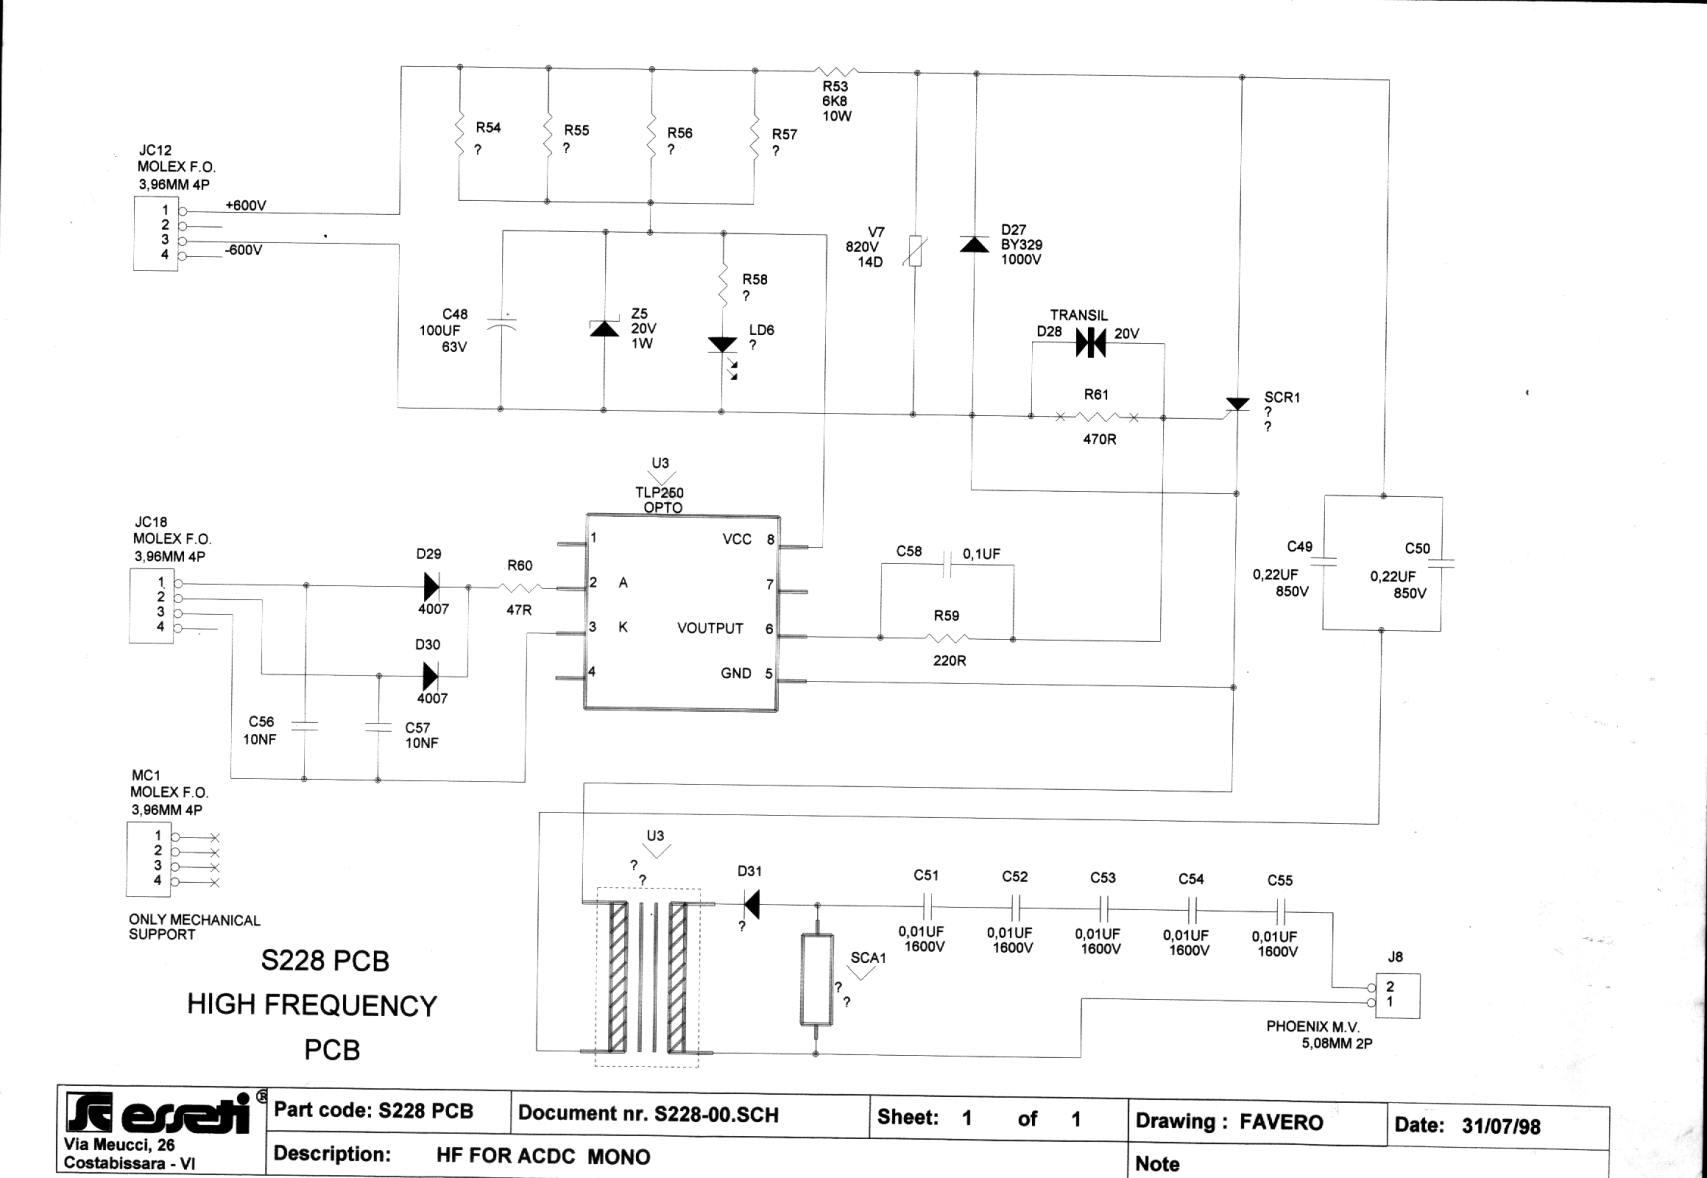 Tolle Spulenschaltplan Fotos - Elektrische Schaltplan-Ideen ...